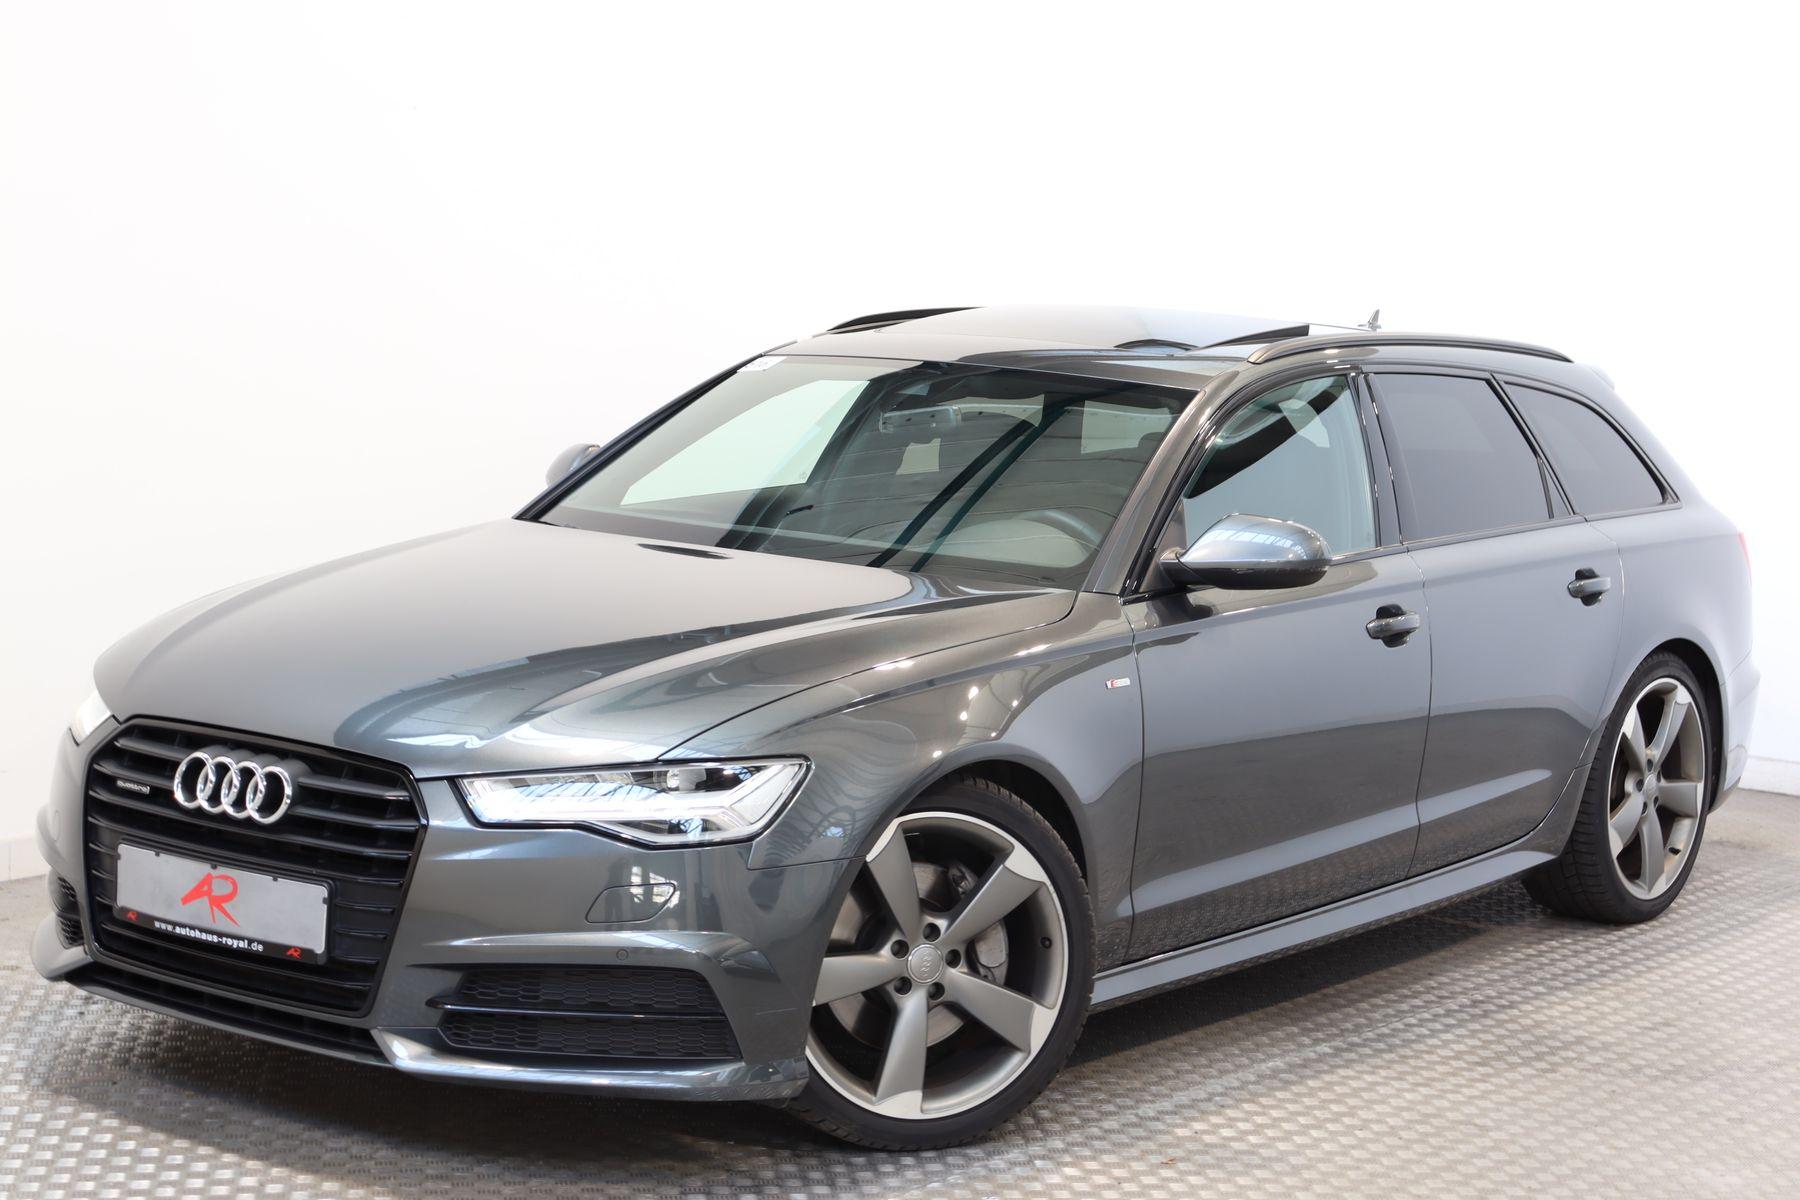 Audi A6 Avant 2.0 TFSI qu 3x S LINE MEMORY,OPTIKPAKET, Jahr 2016, Benzin